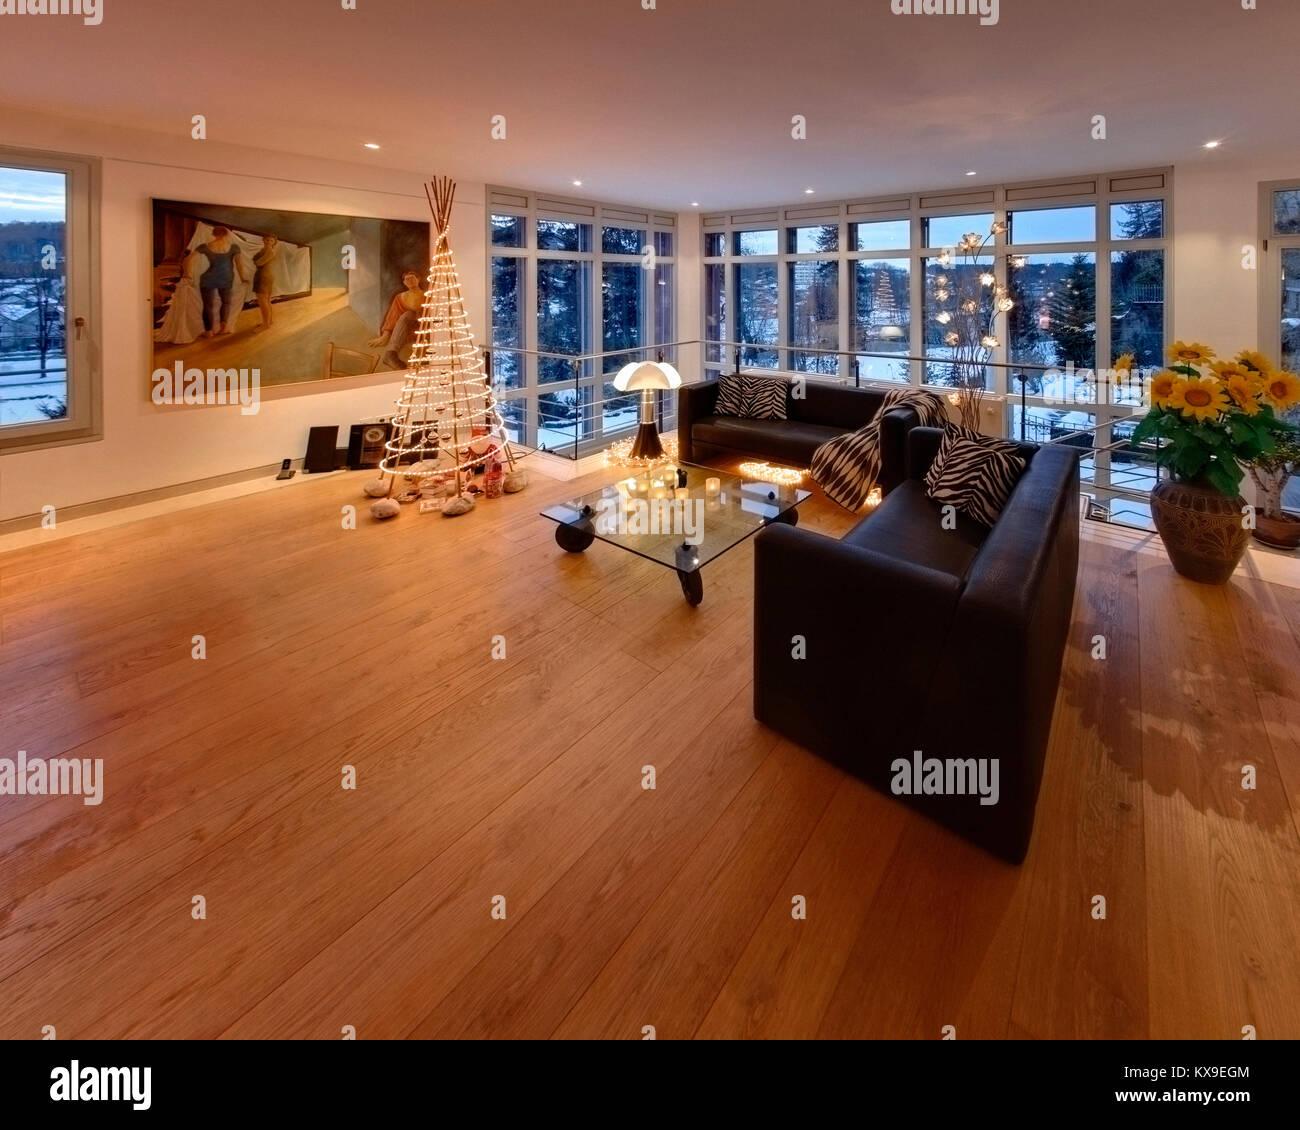 DE - BAVARIA: Contemporary Interior  (HDR Image) - Stock Image